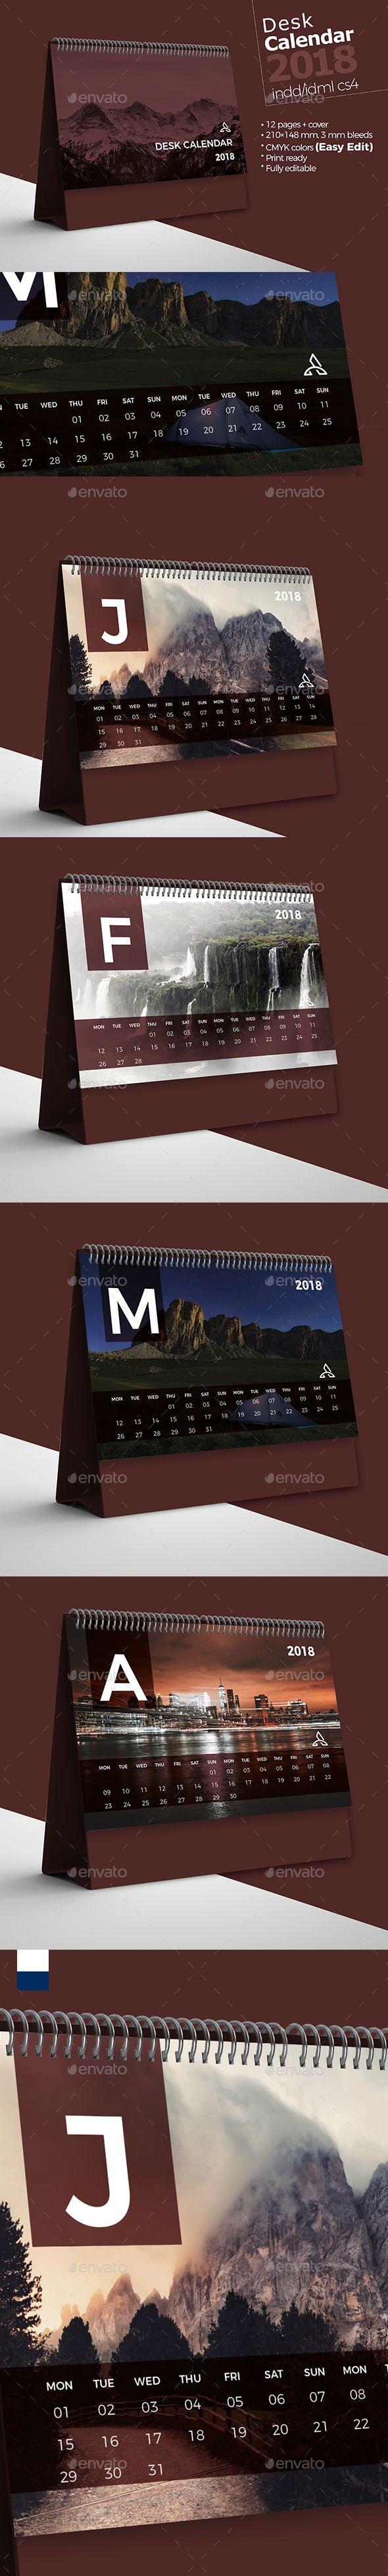 Desk Calendar 2018 — InDesign INDD #notes • Available here ➝ https://graphicriver.net/item/desk-calendar-2018/21023772?ref=pxcr